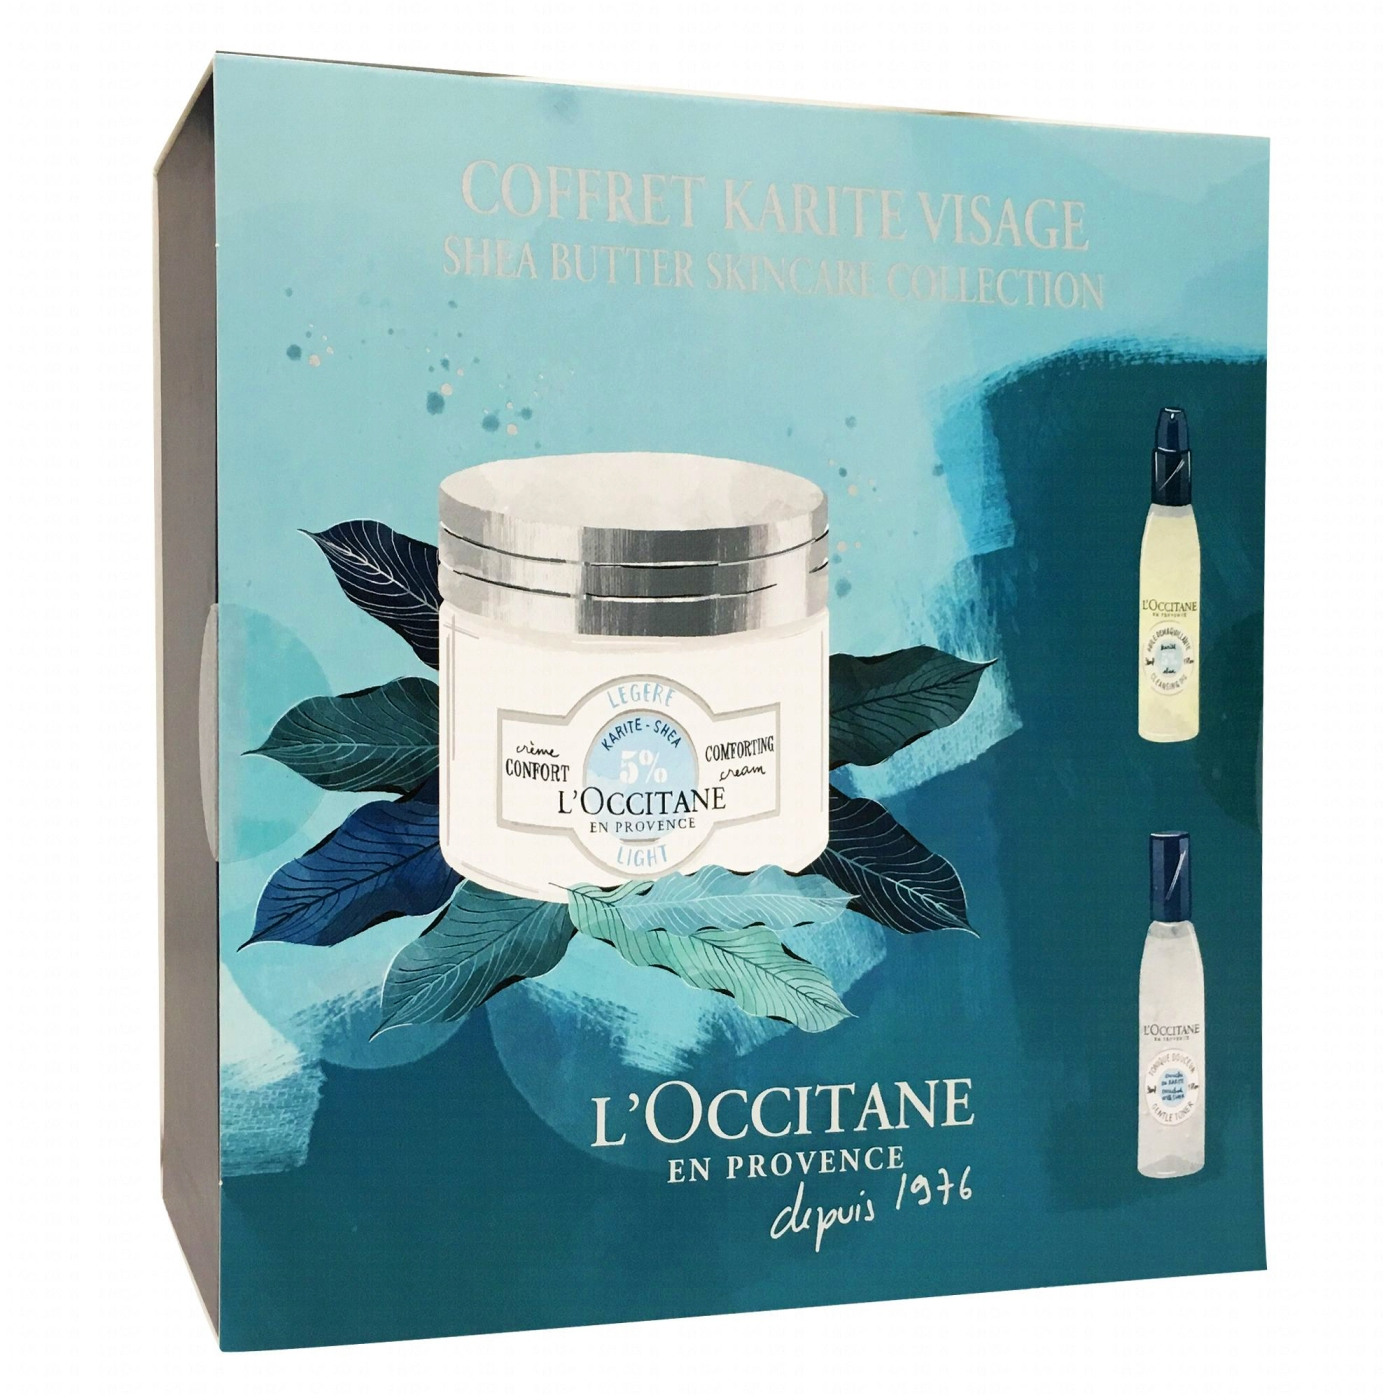 occitane-coffret-karite-visage-2-32084_2_1480090134